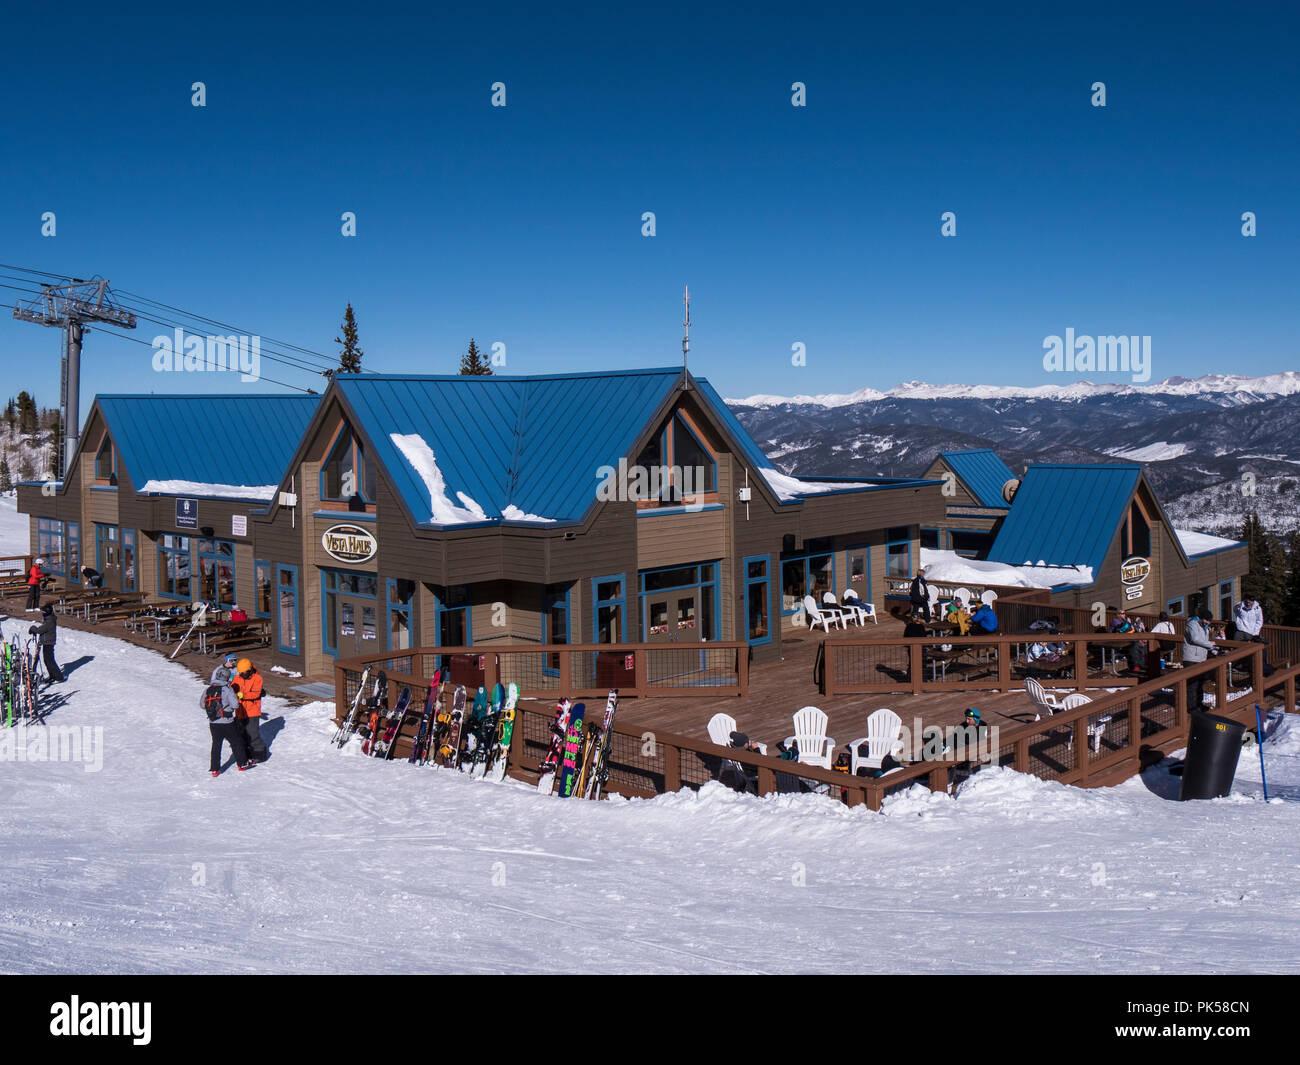 Vista Haus day lodge and restaurant atop Peak 8, Breckenridge Ski Resort, Breckenridge, Colorado. - Stock Image